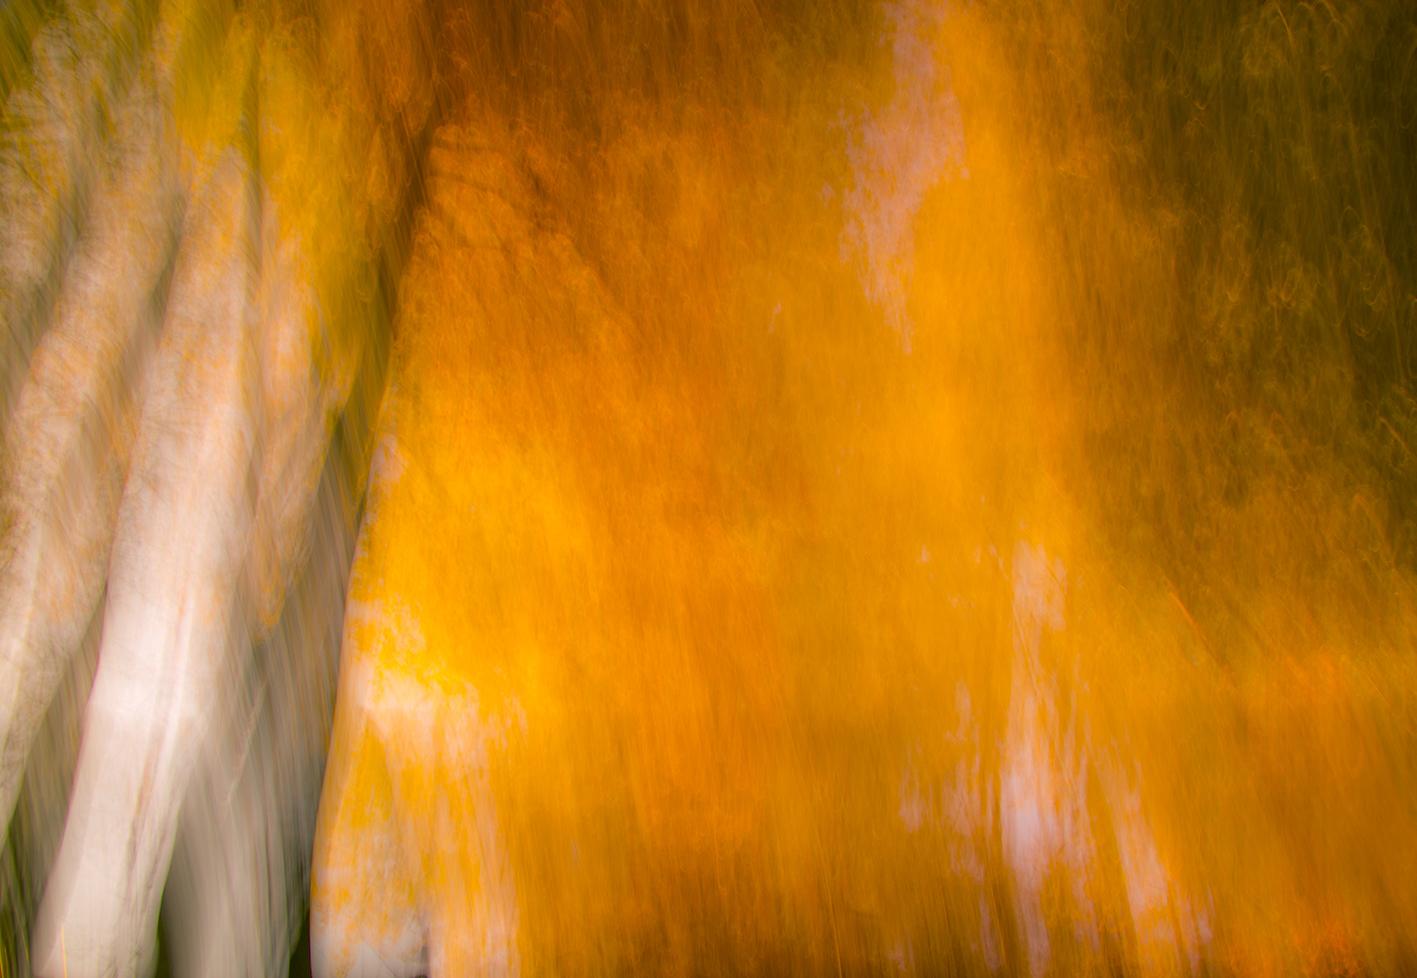 Fallendes gelbes Laub